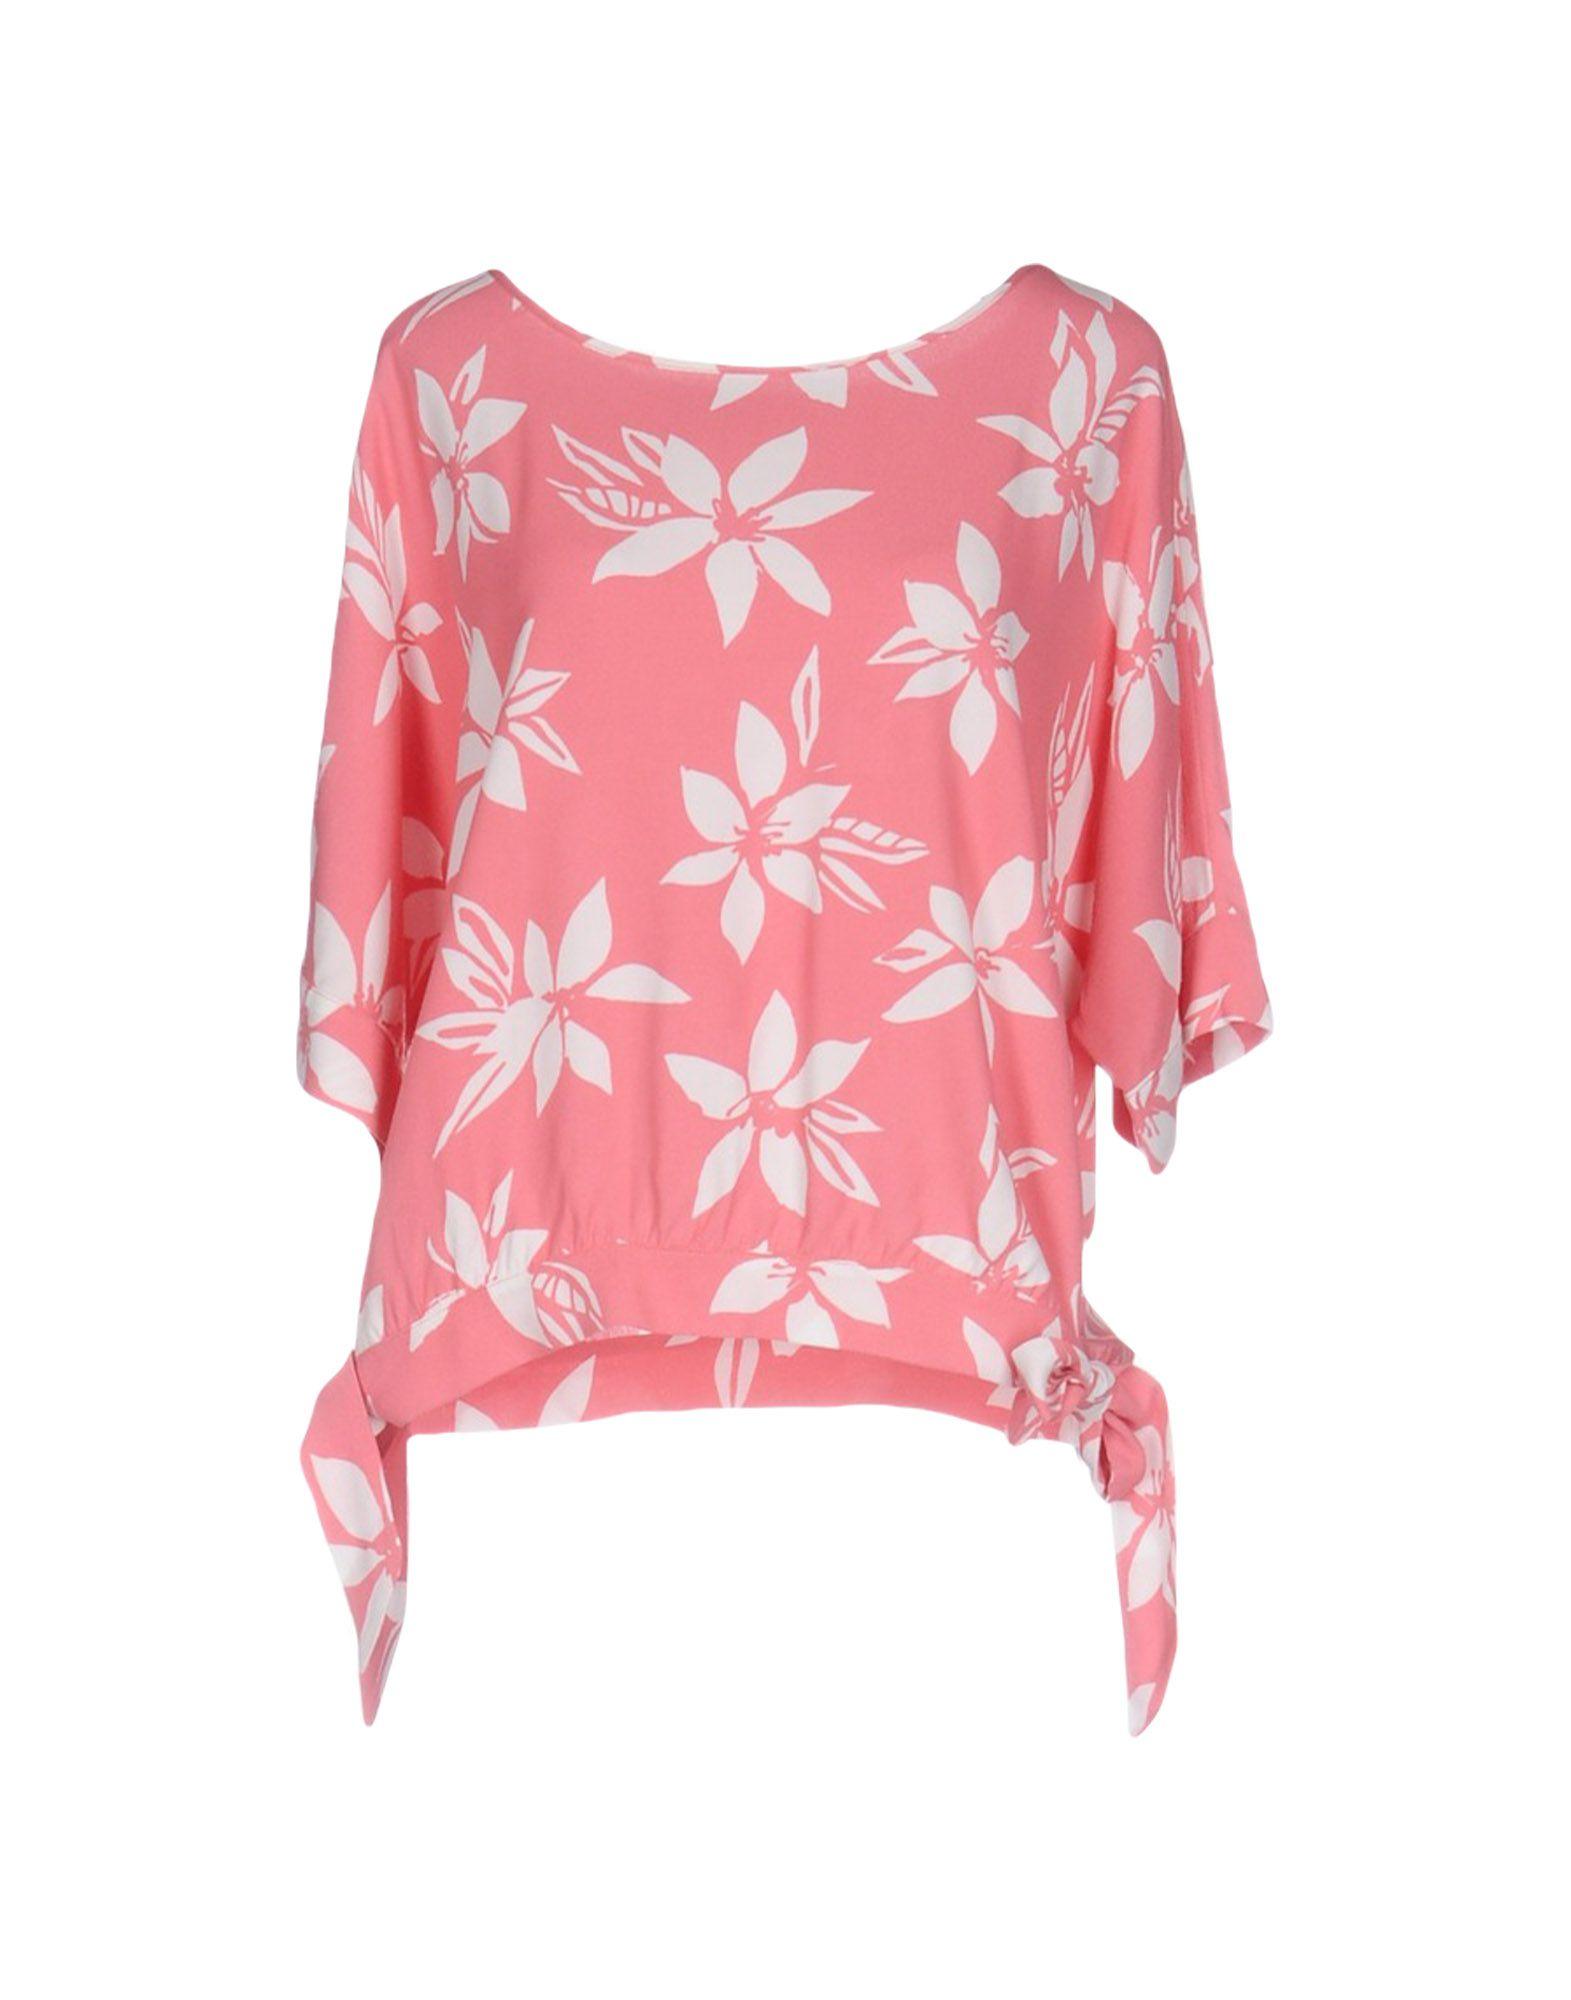 PAUL & JOE Damen Bluse Farbe Rosa Größe 4 jetztbilligerkaufen